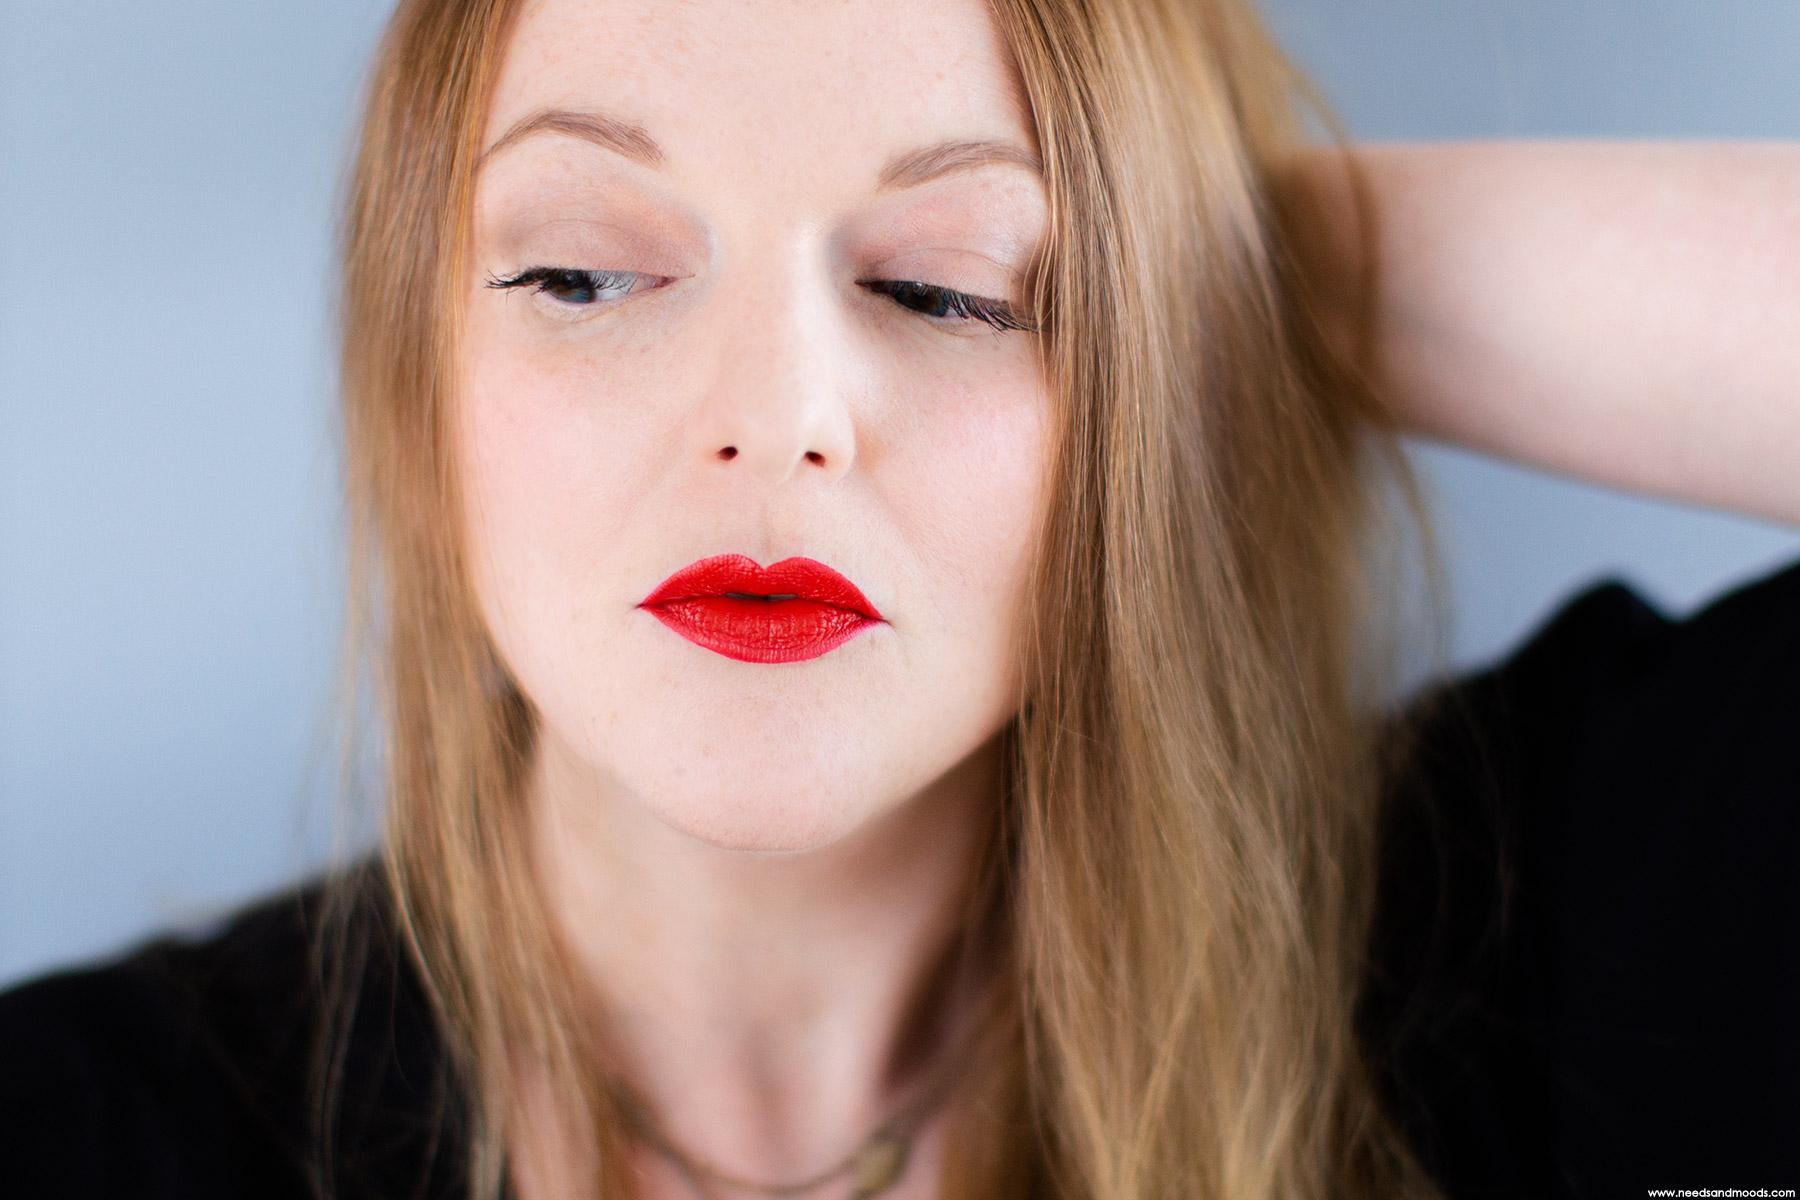 yves saint laurent tatouage couture rouge tatouage swatch